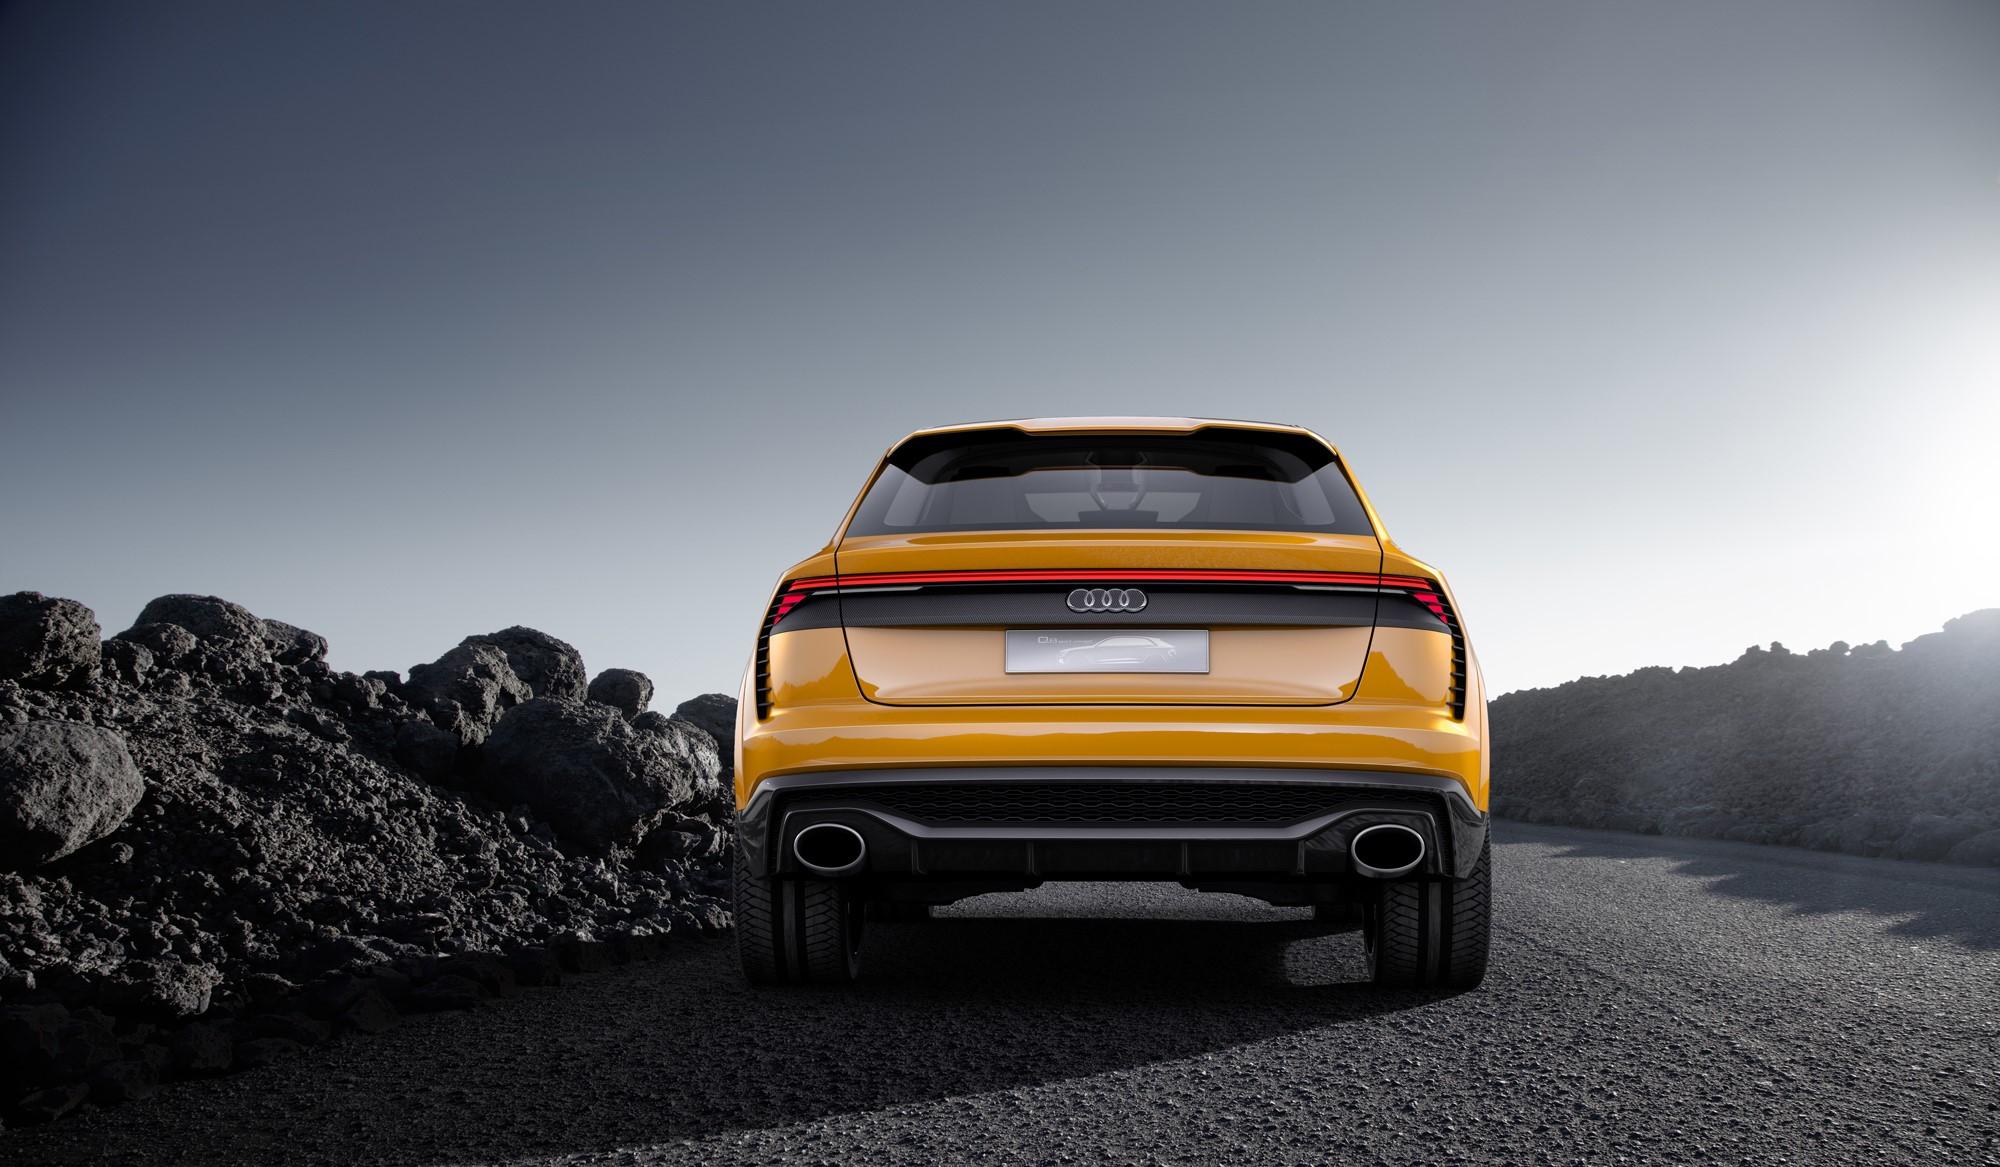 Audi Q8 Sport Wallpapers